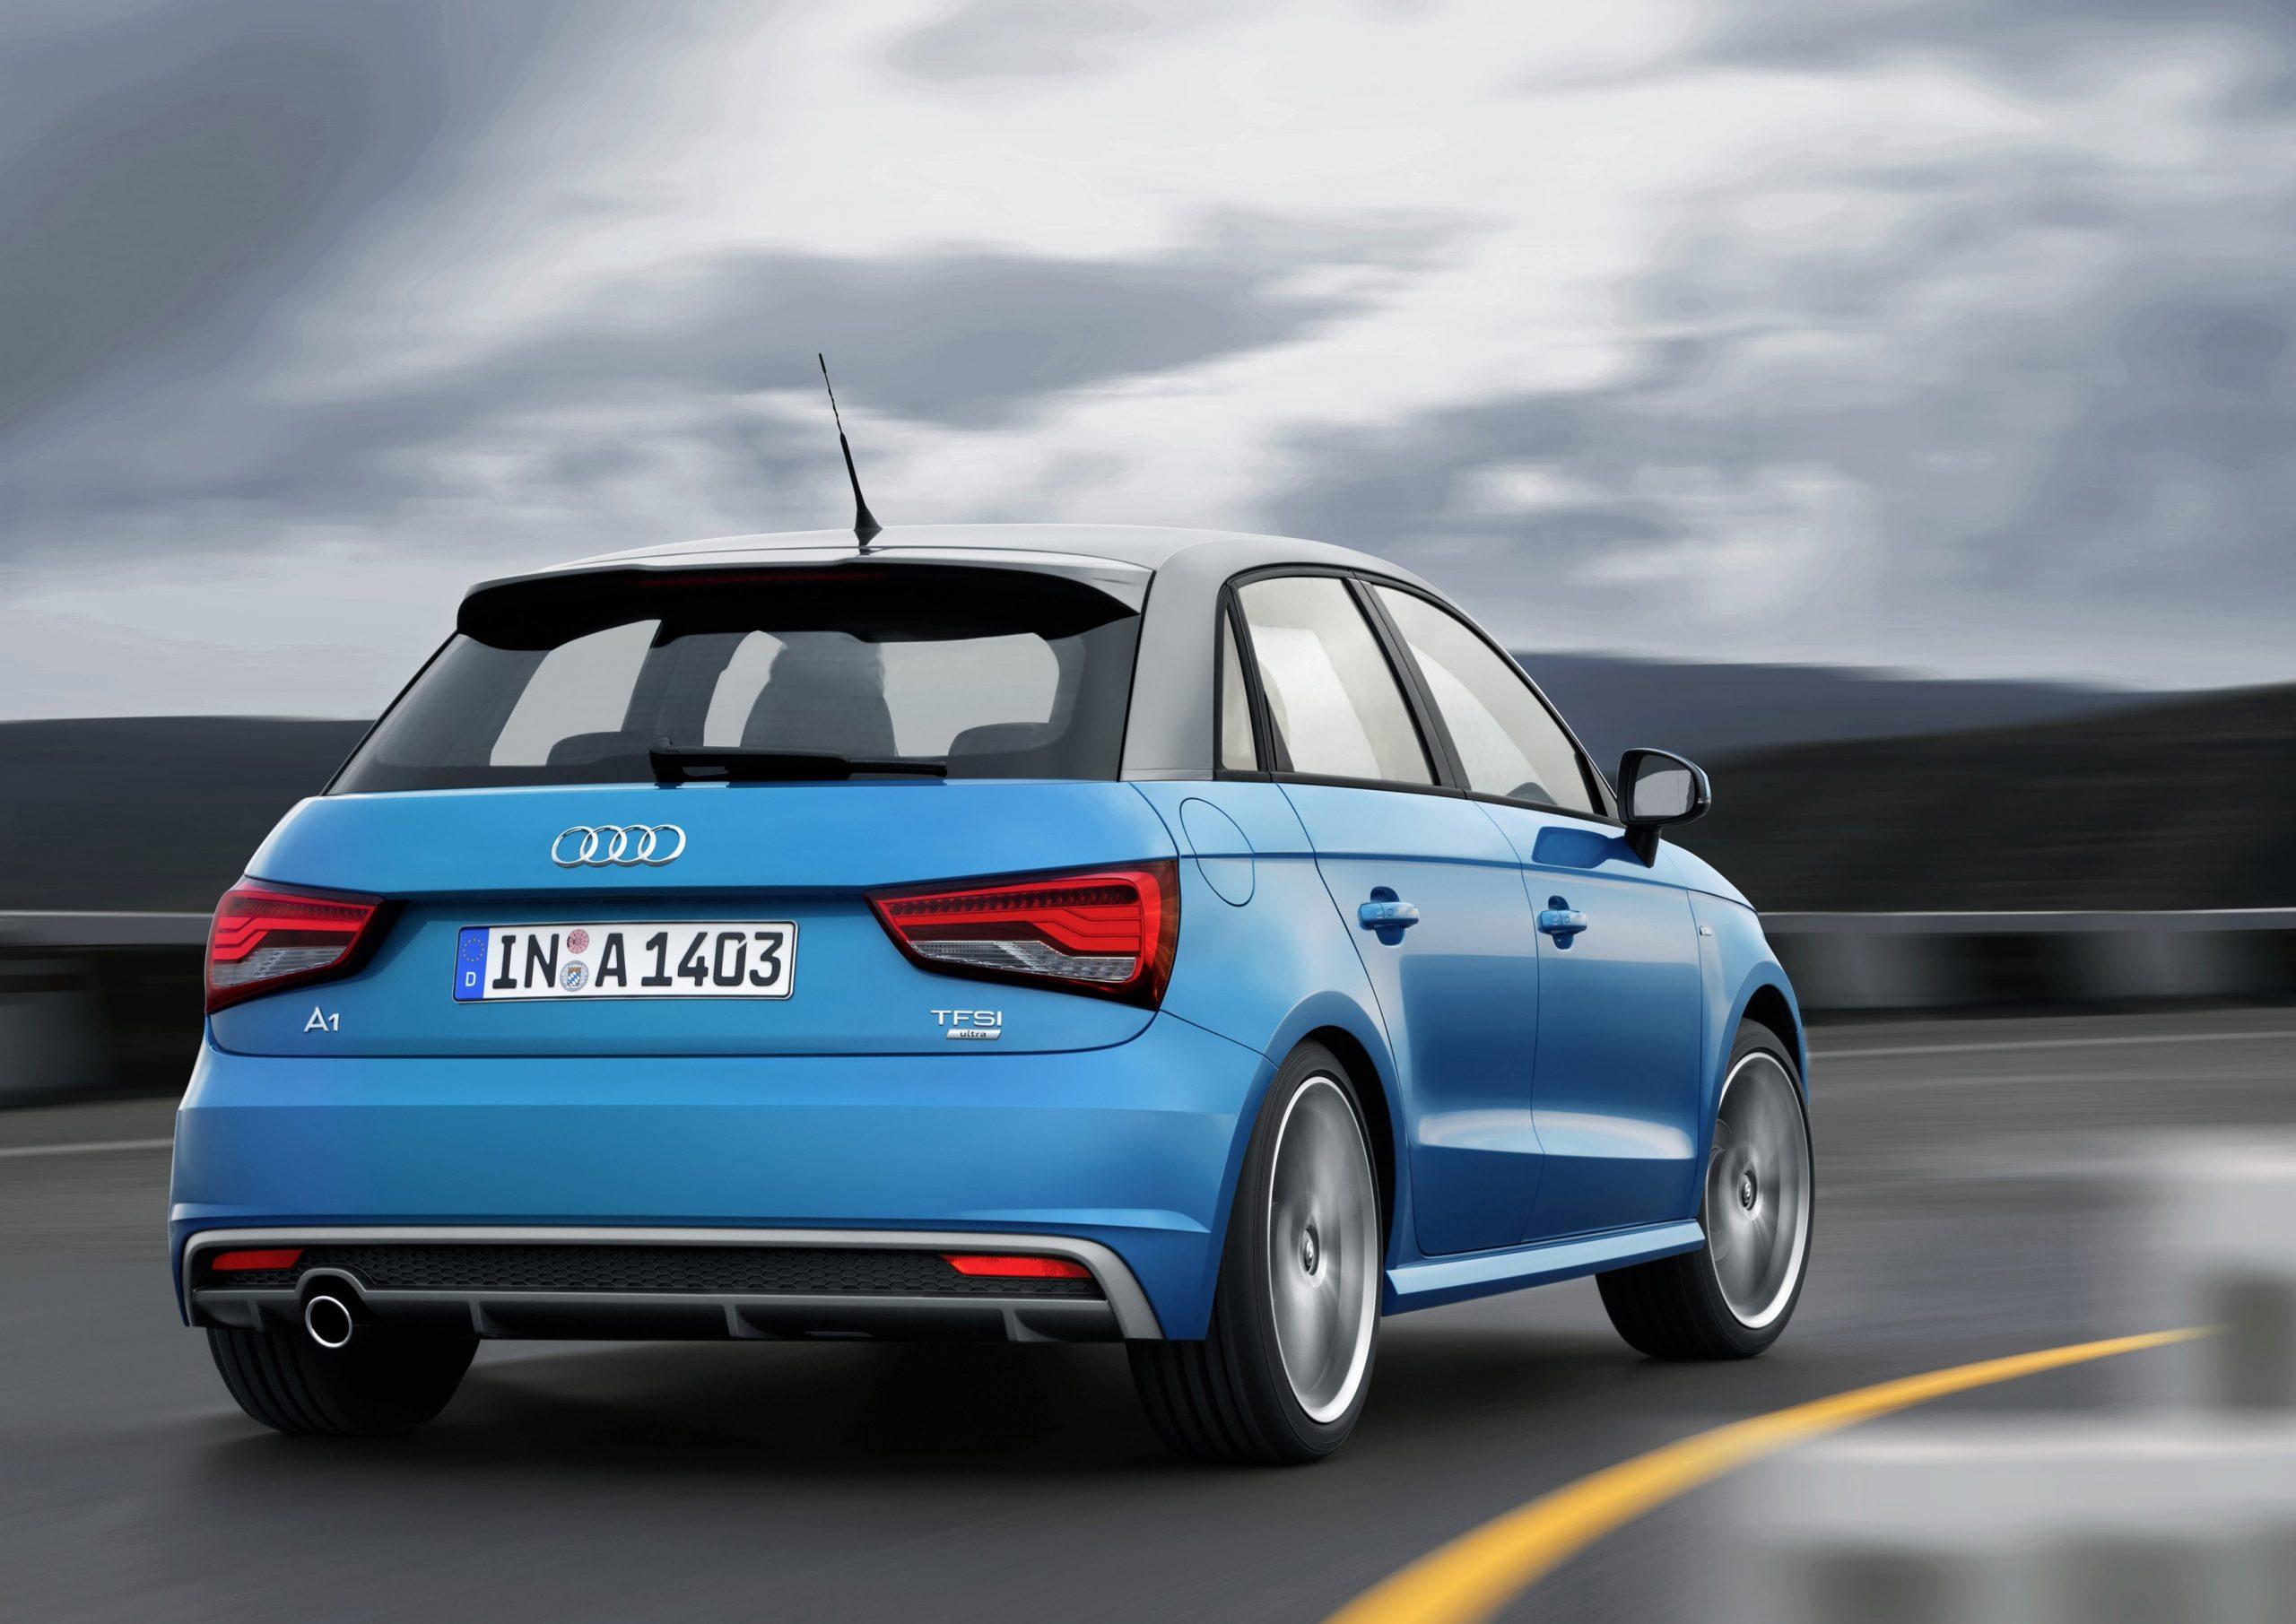 Audi A1 Windows Wallpapers